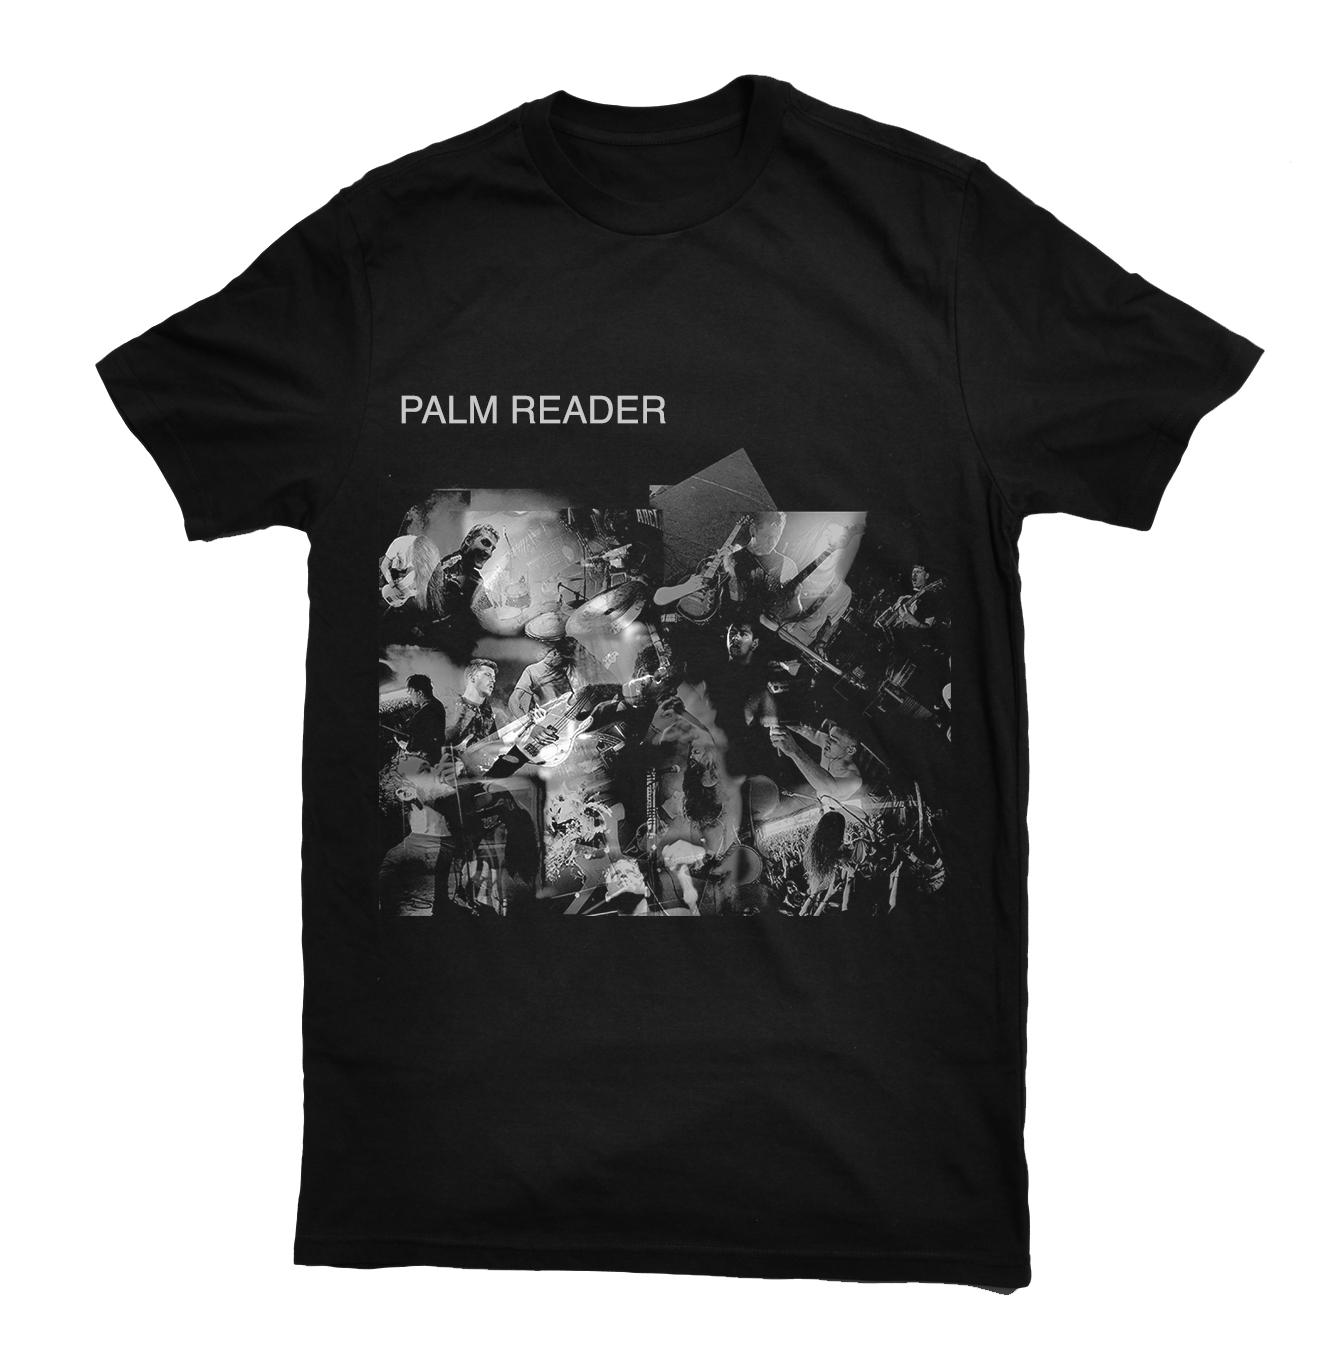 Conjurer & Palm Reader - Palm Reader shirt